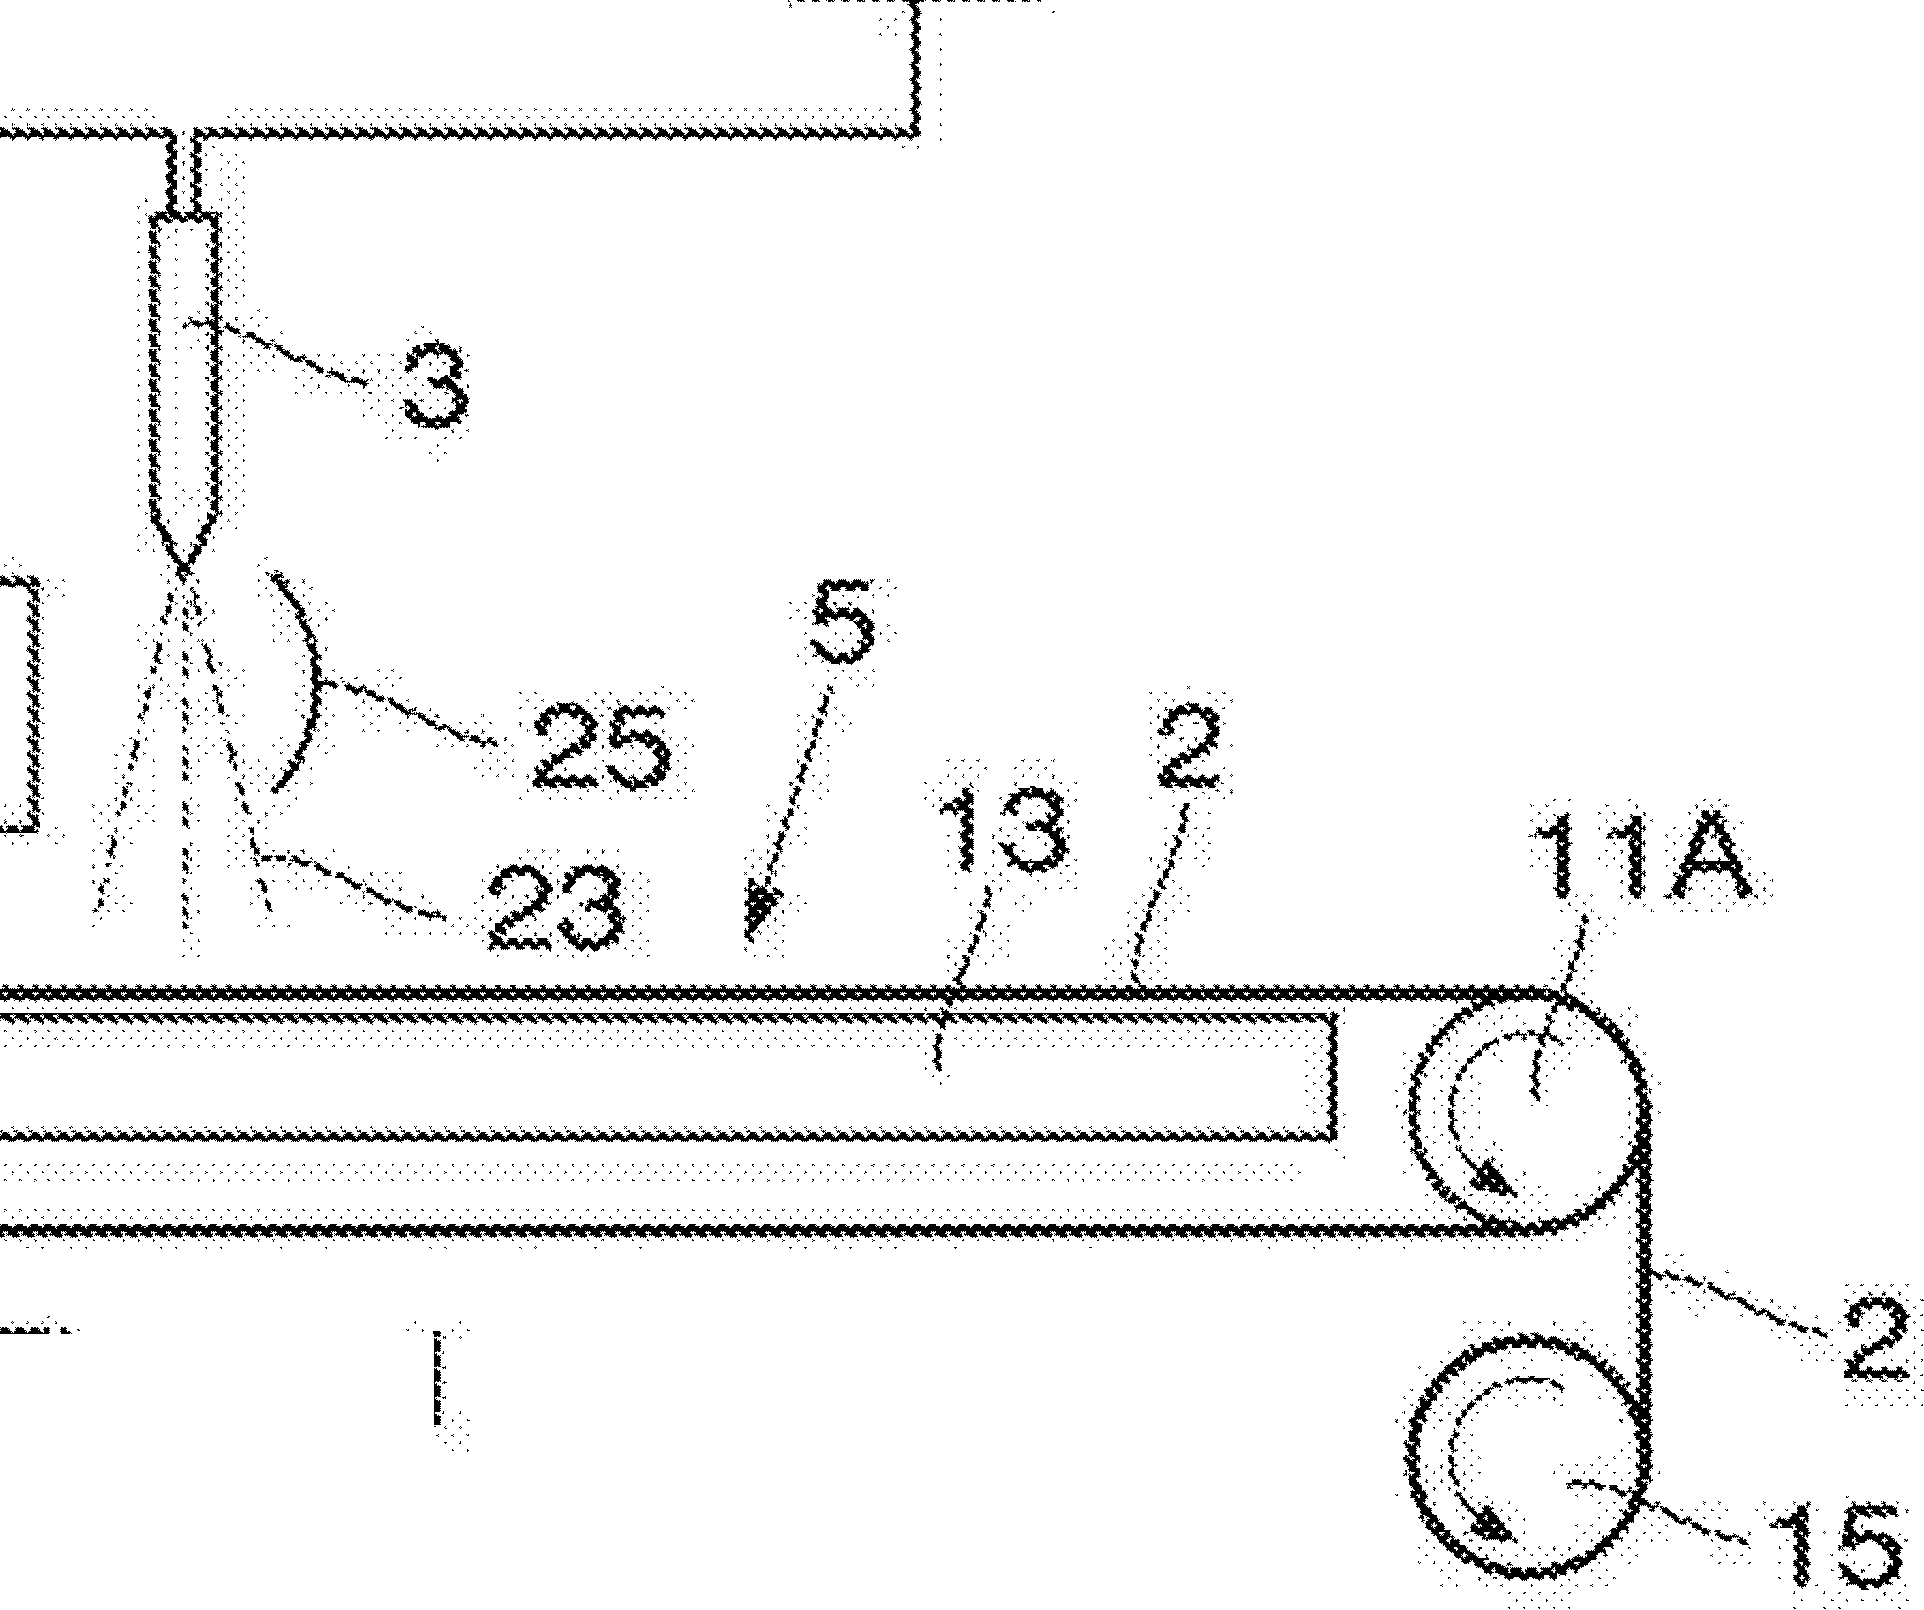 Figure GB2555125A_D0002